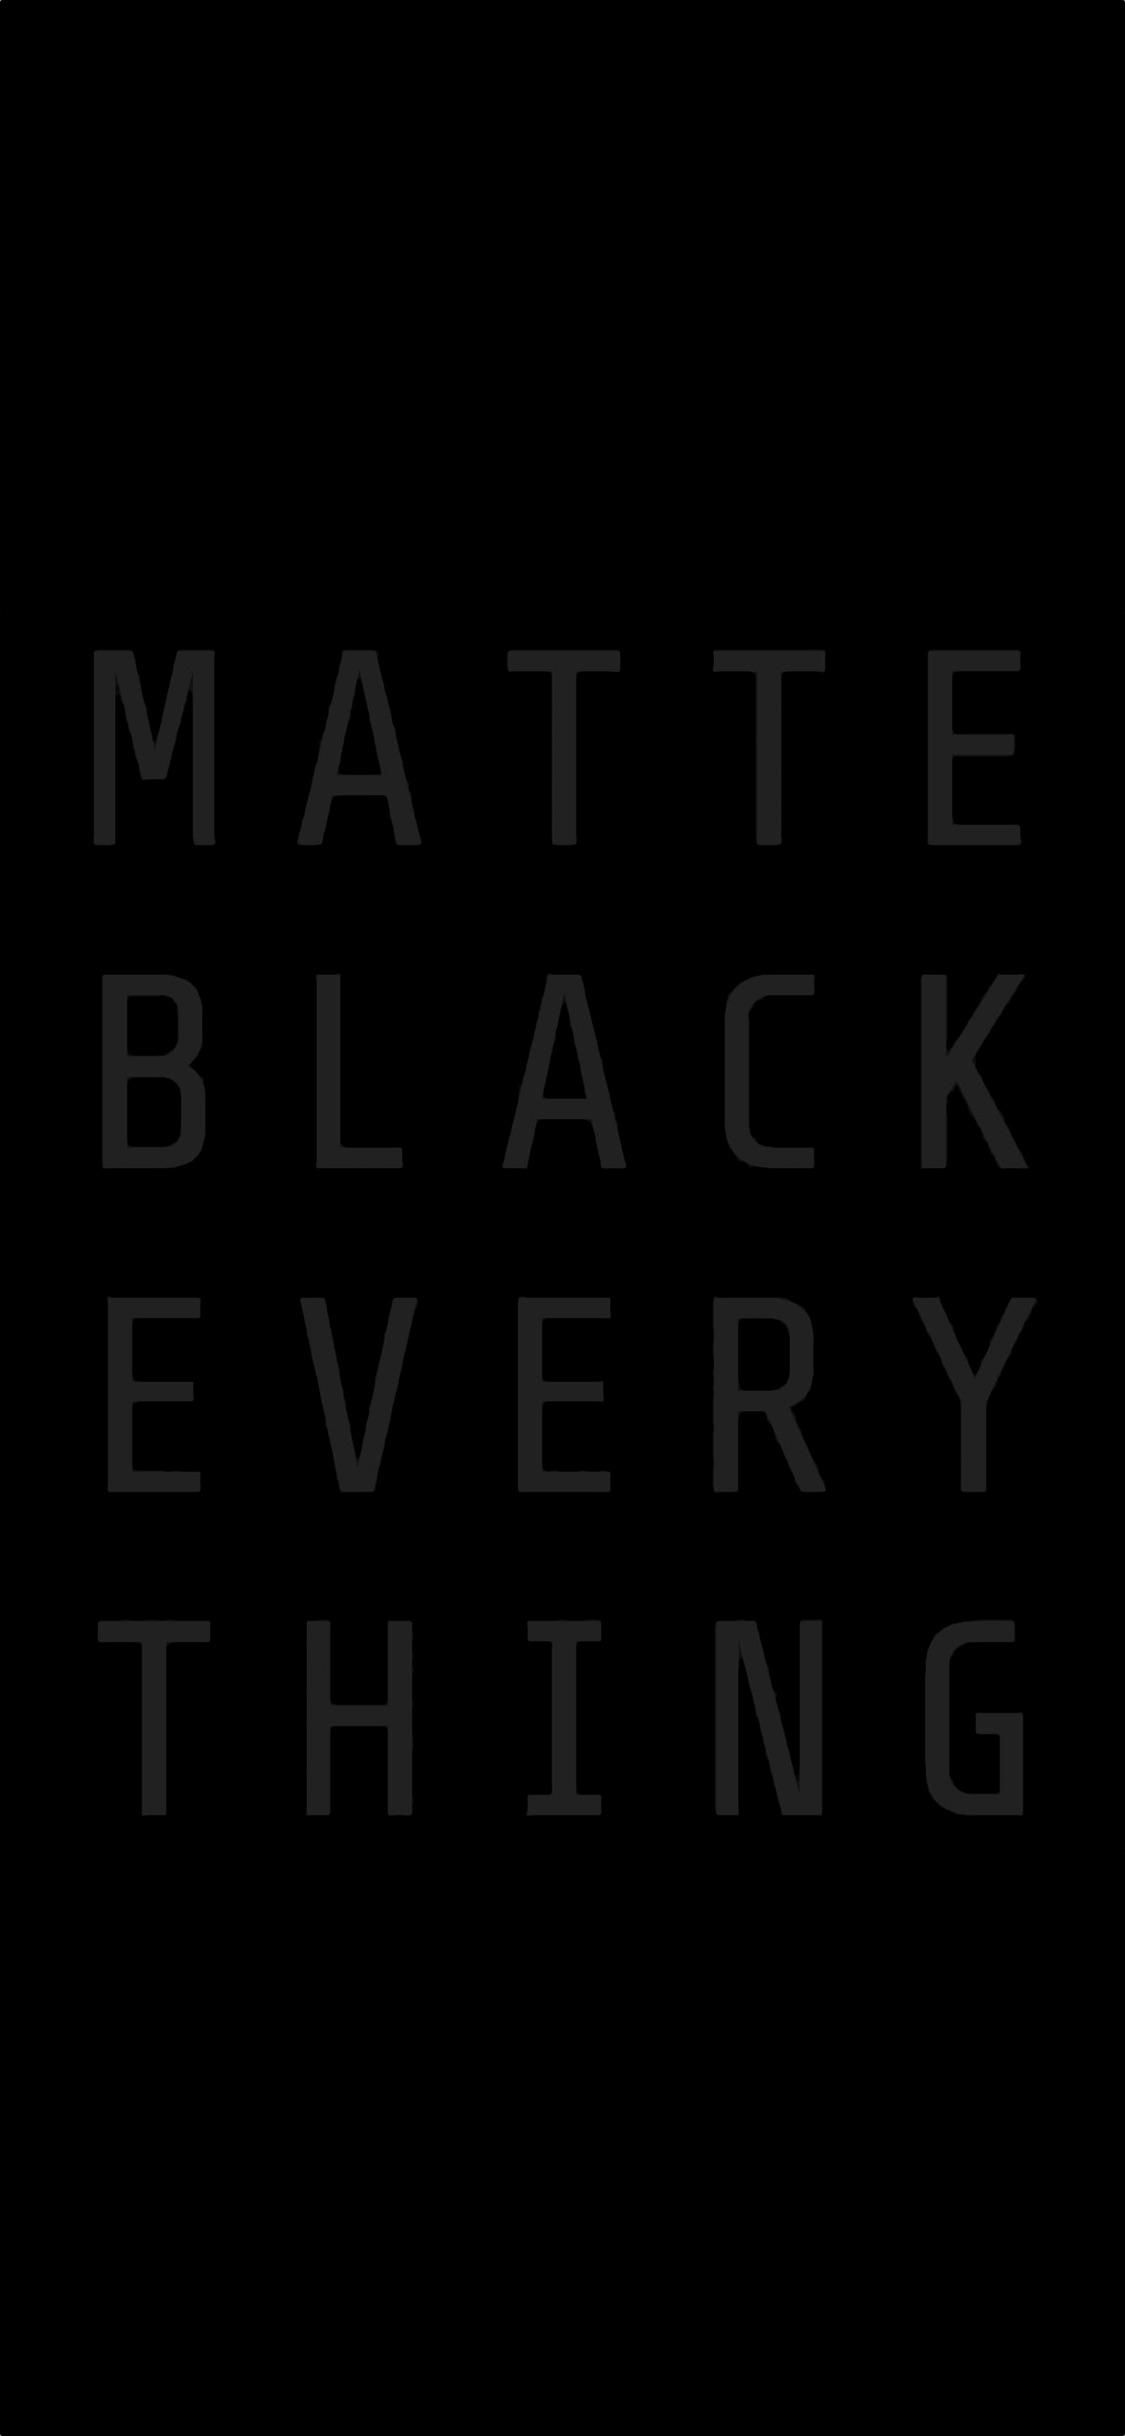 Matte Black Iphone Wallpaper Apple Wallpaper Iphone Iphone Wallpaper Black Wallpaper Iphone